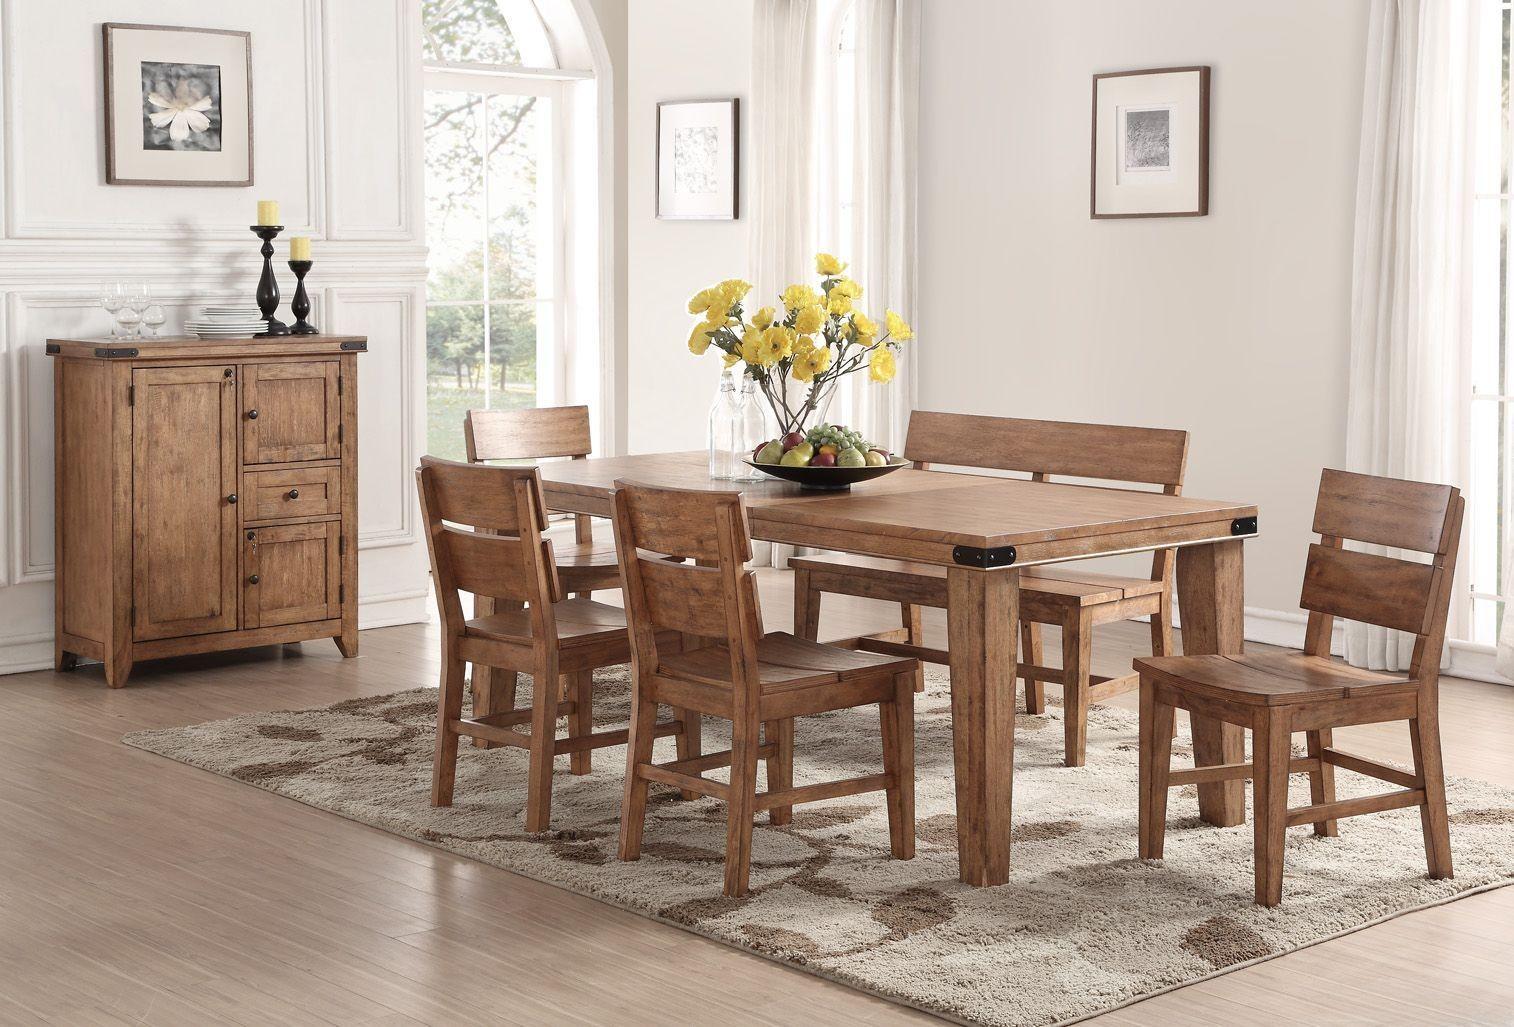 Shenandoah light rustic dining room set